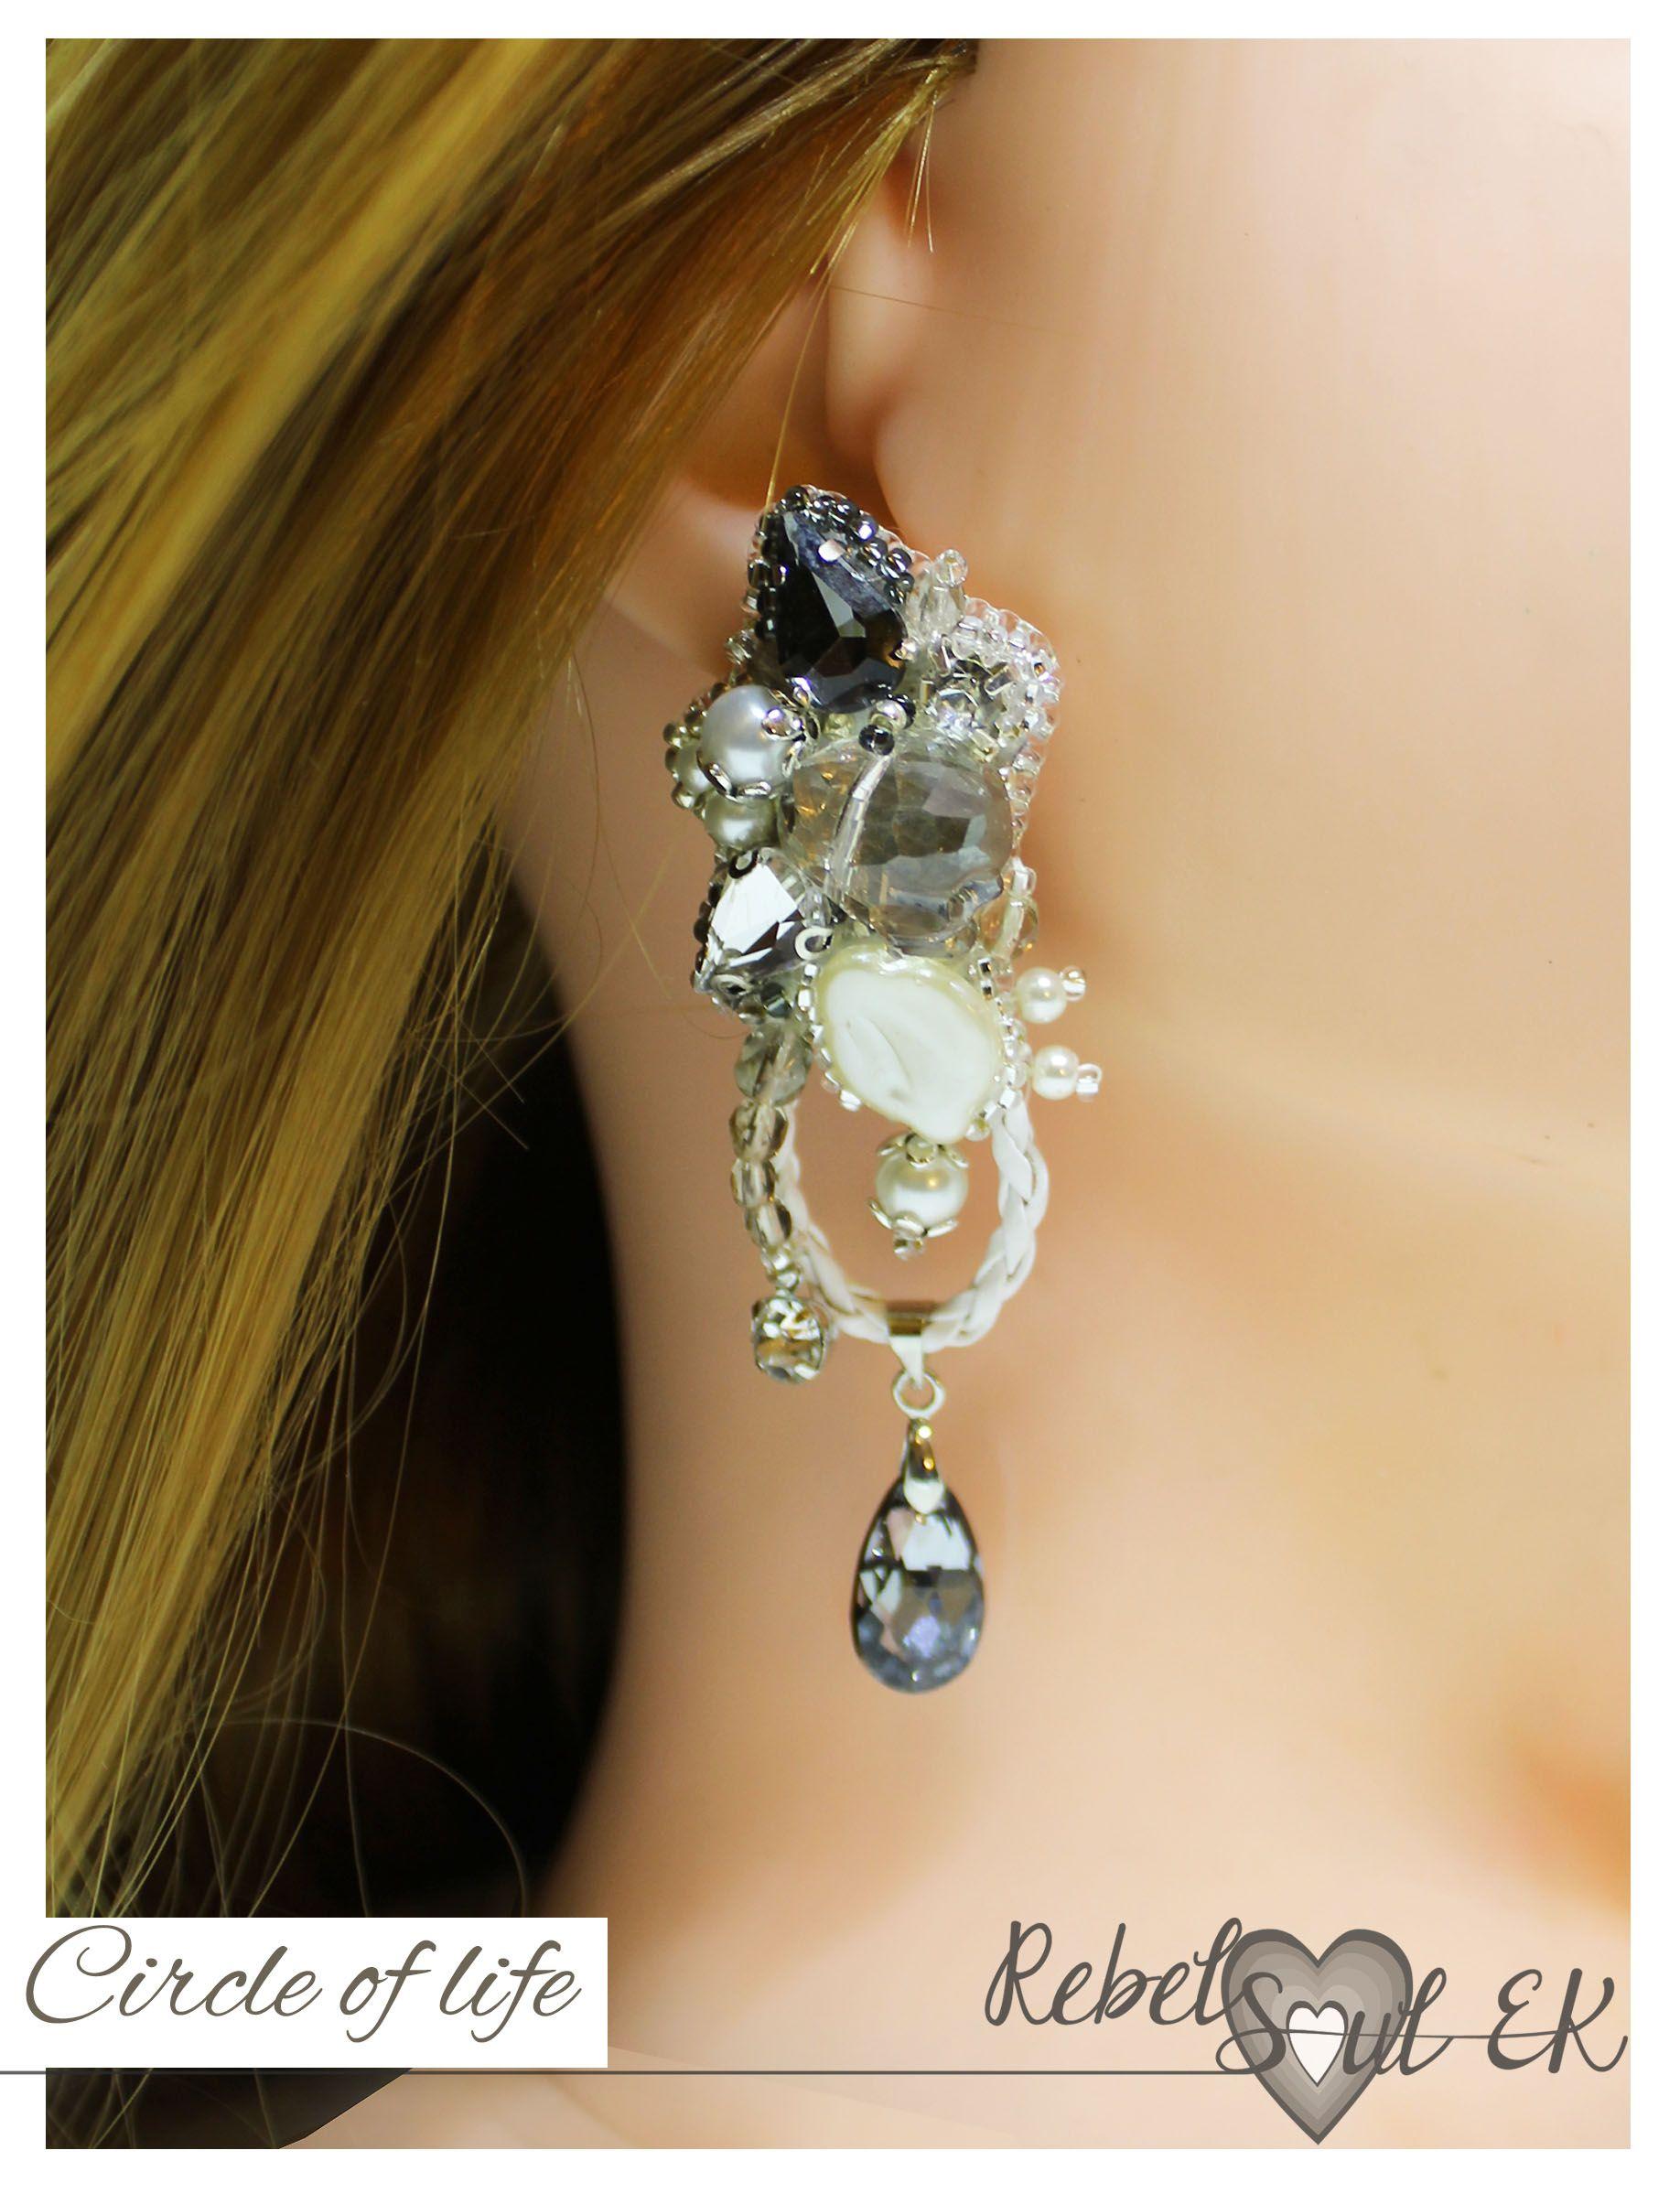 b571a5771 Pirate jewelry, white beadwork wedding jewelry, sculls bracelet, art earrings  long, bridal jewelry, art earrings long, statement bracelet